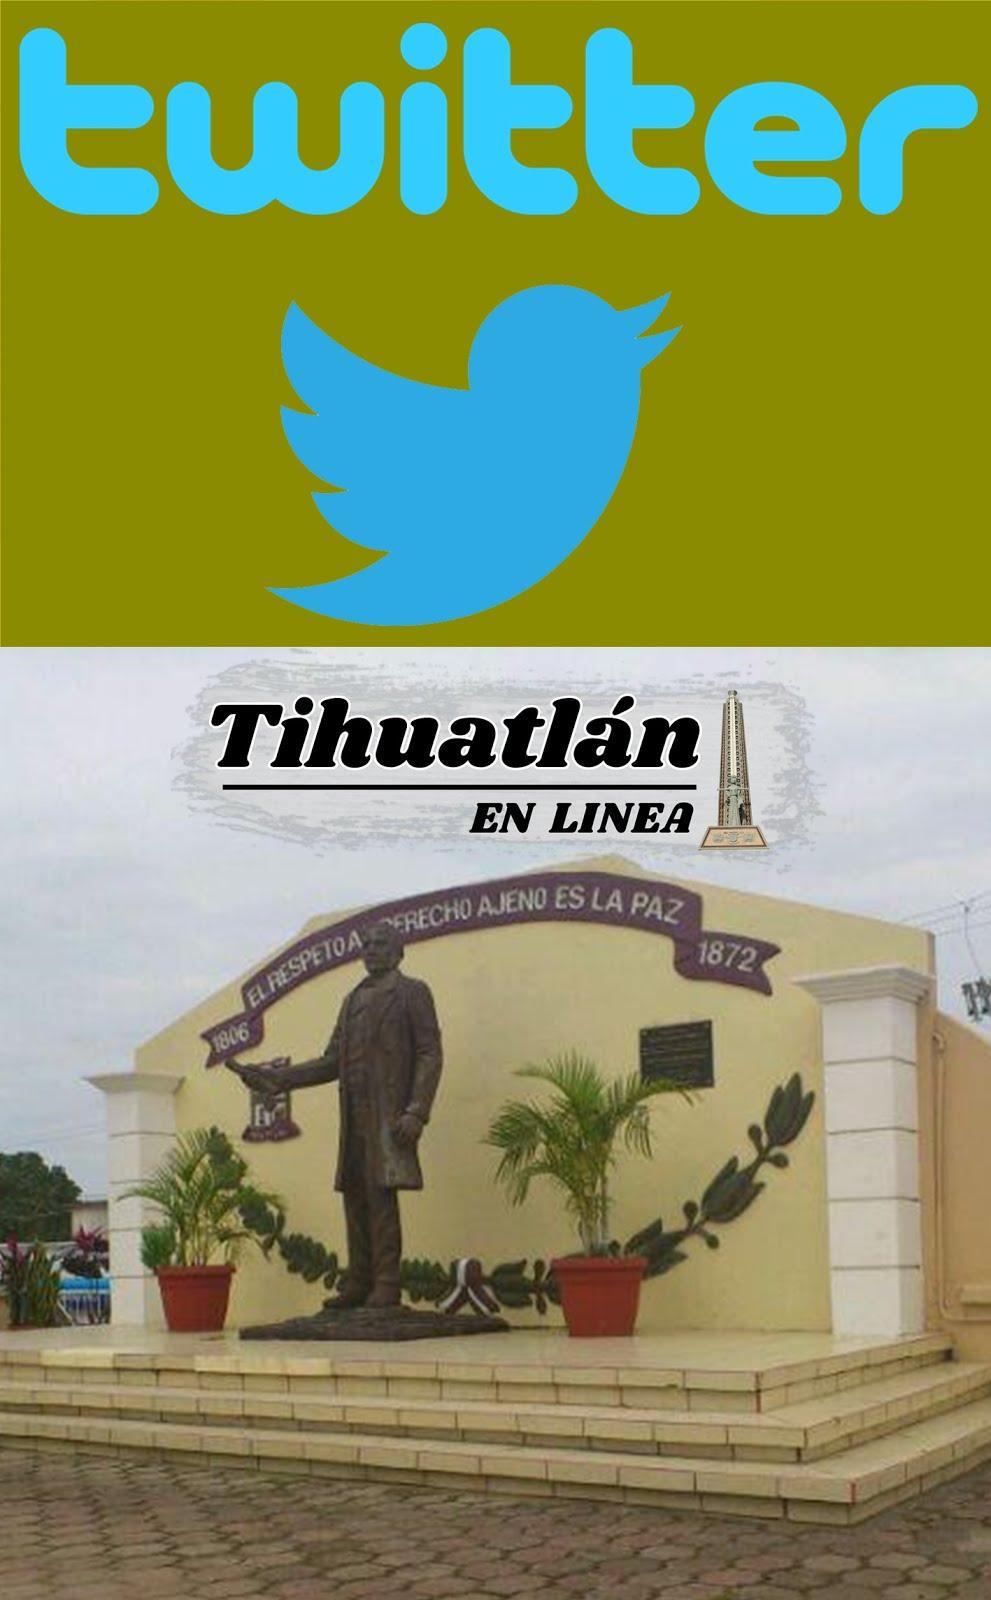 Twitter Tihuatlan: